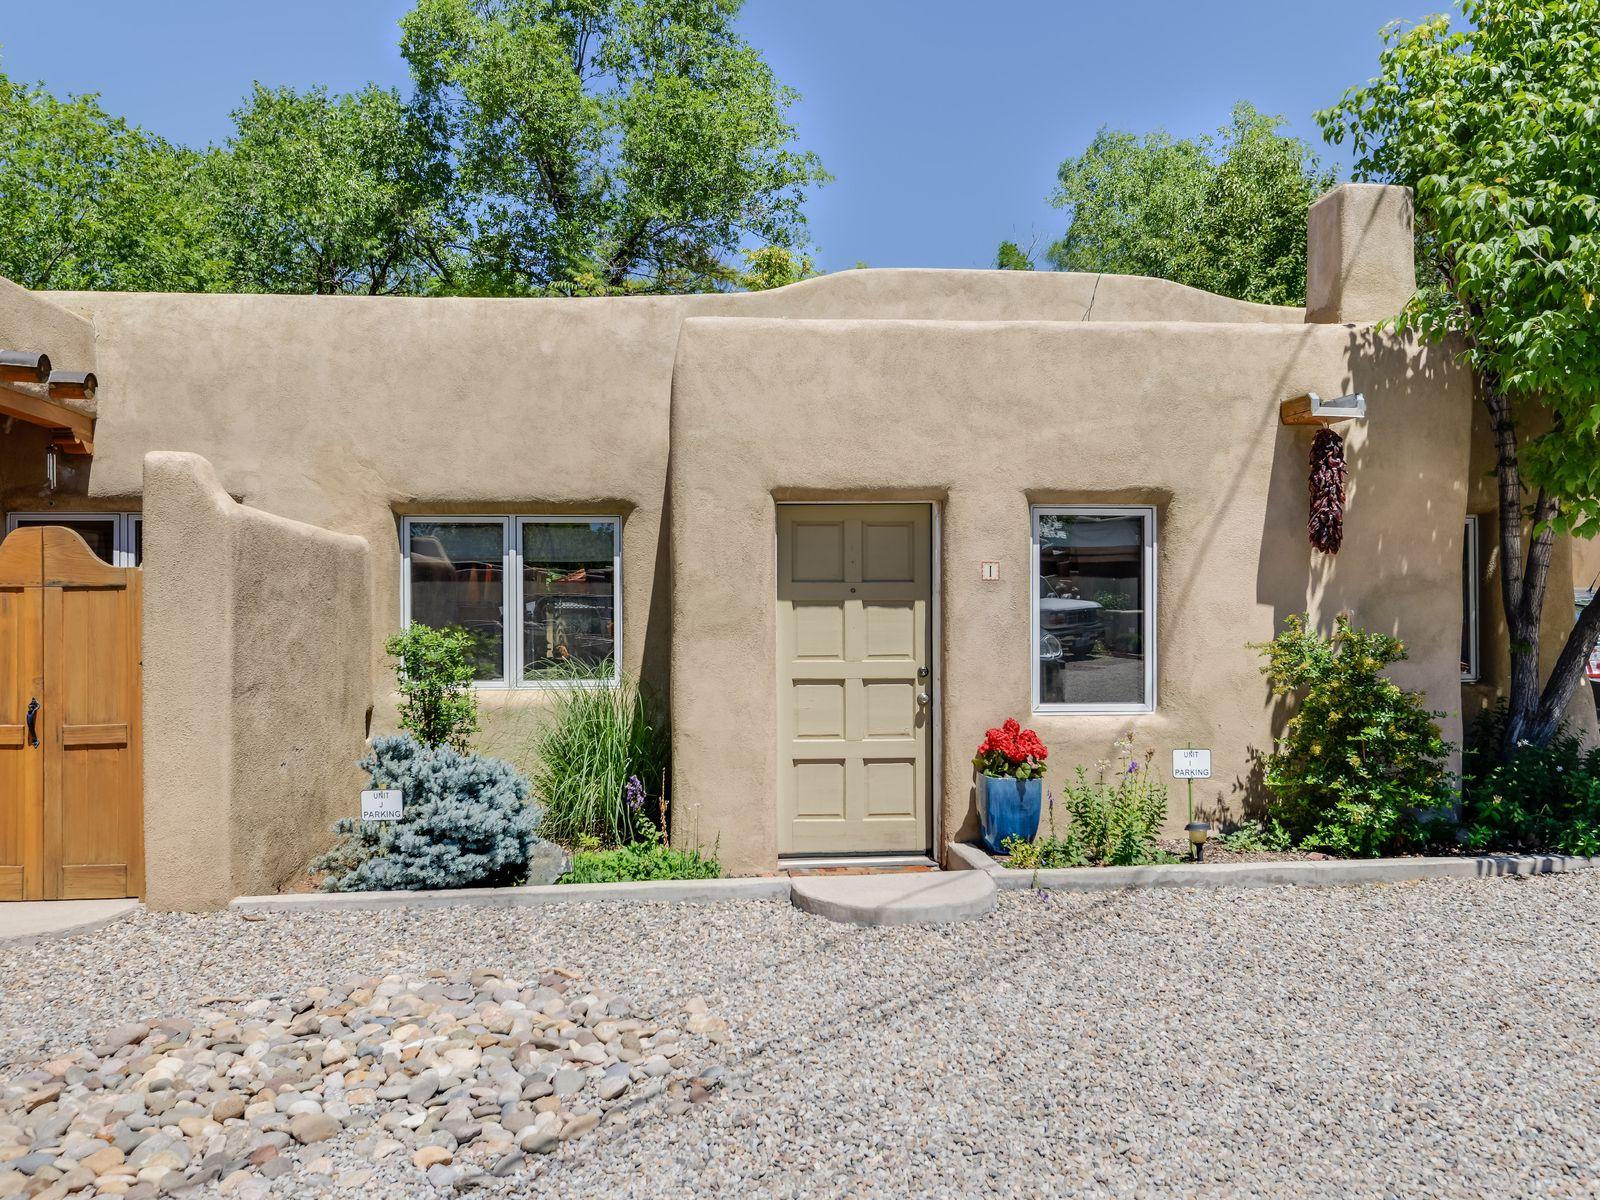 115 W. Santa Fe Avenue, Unit I